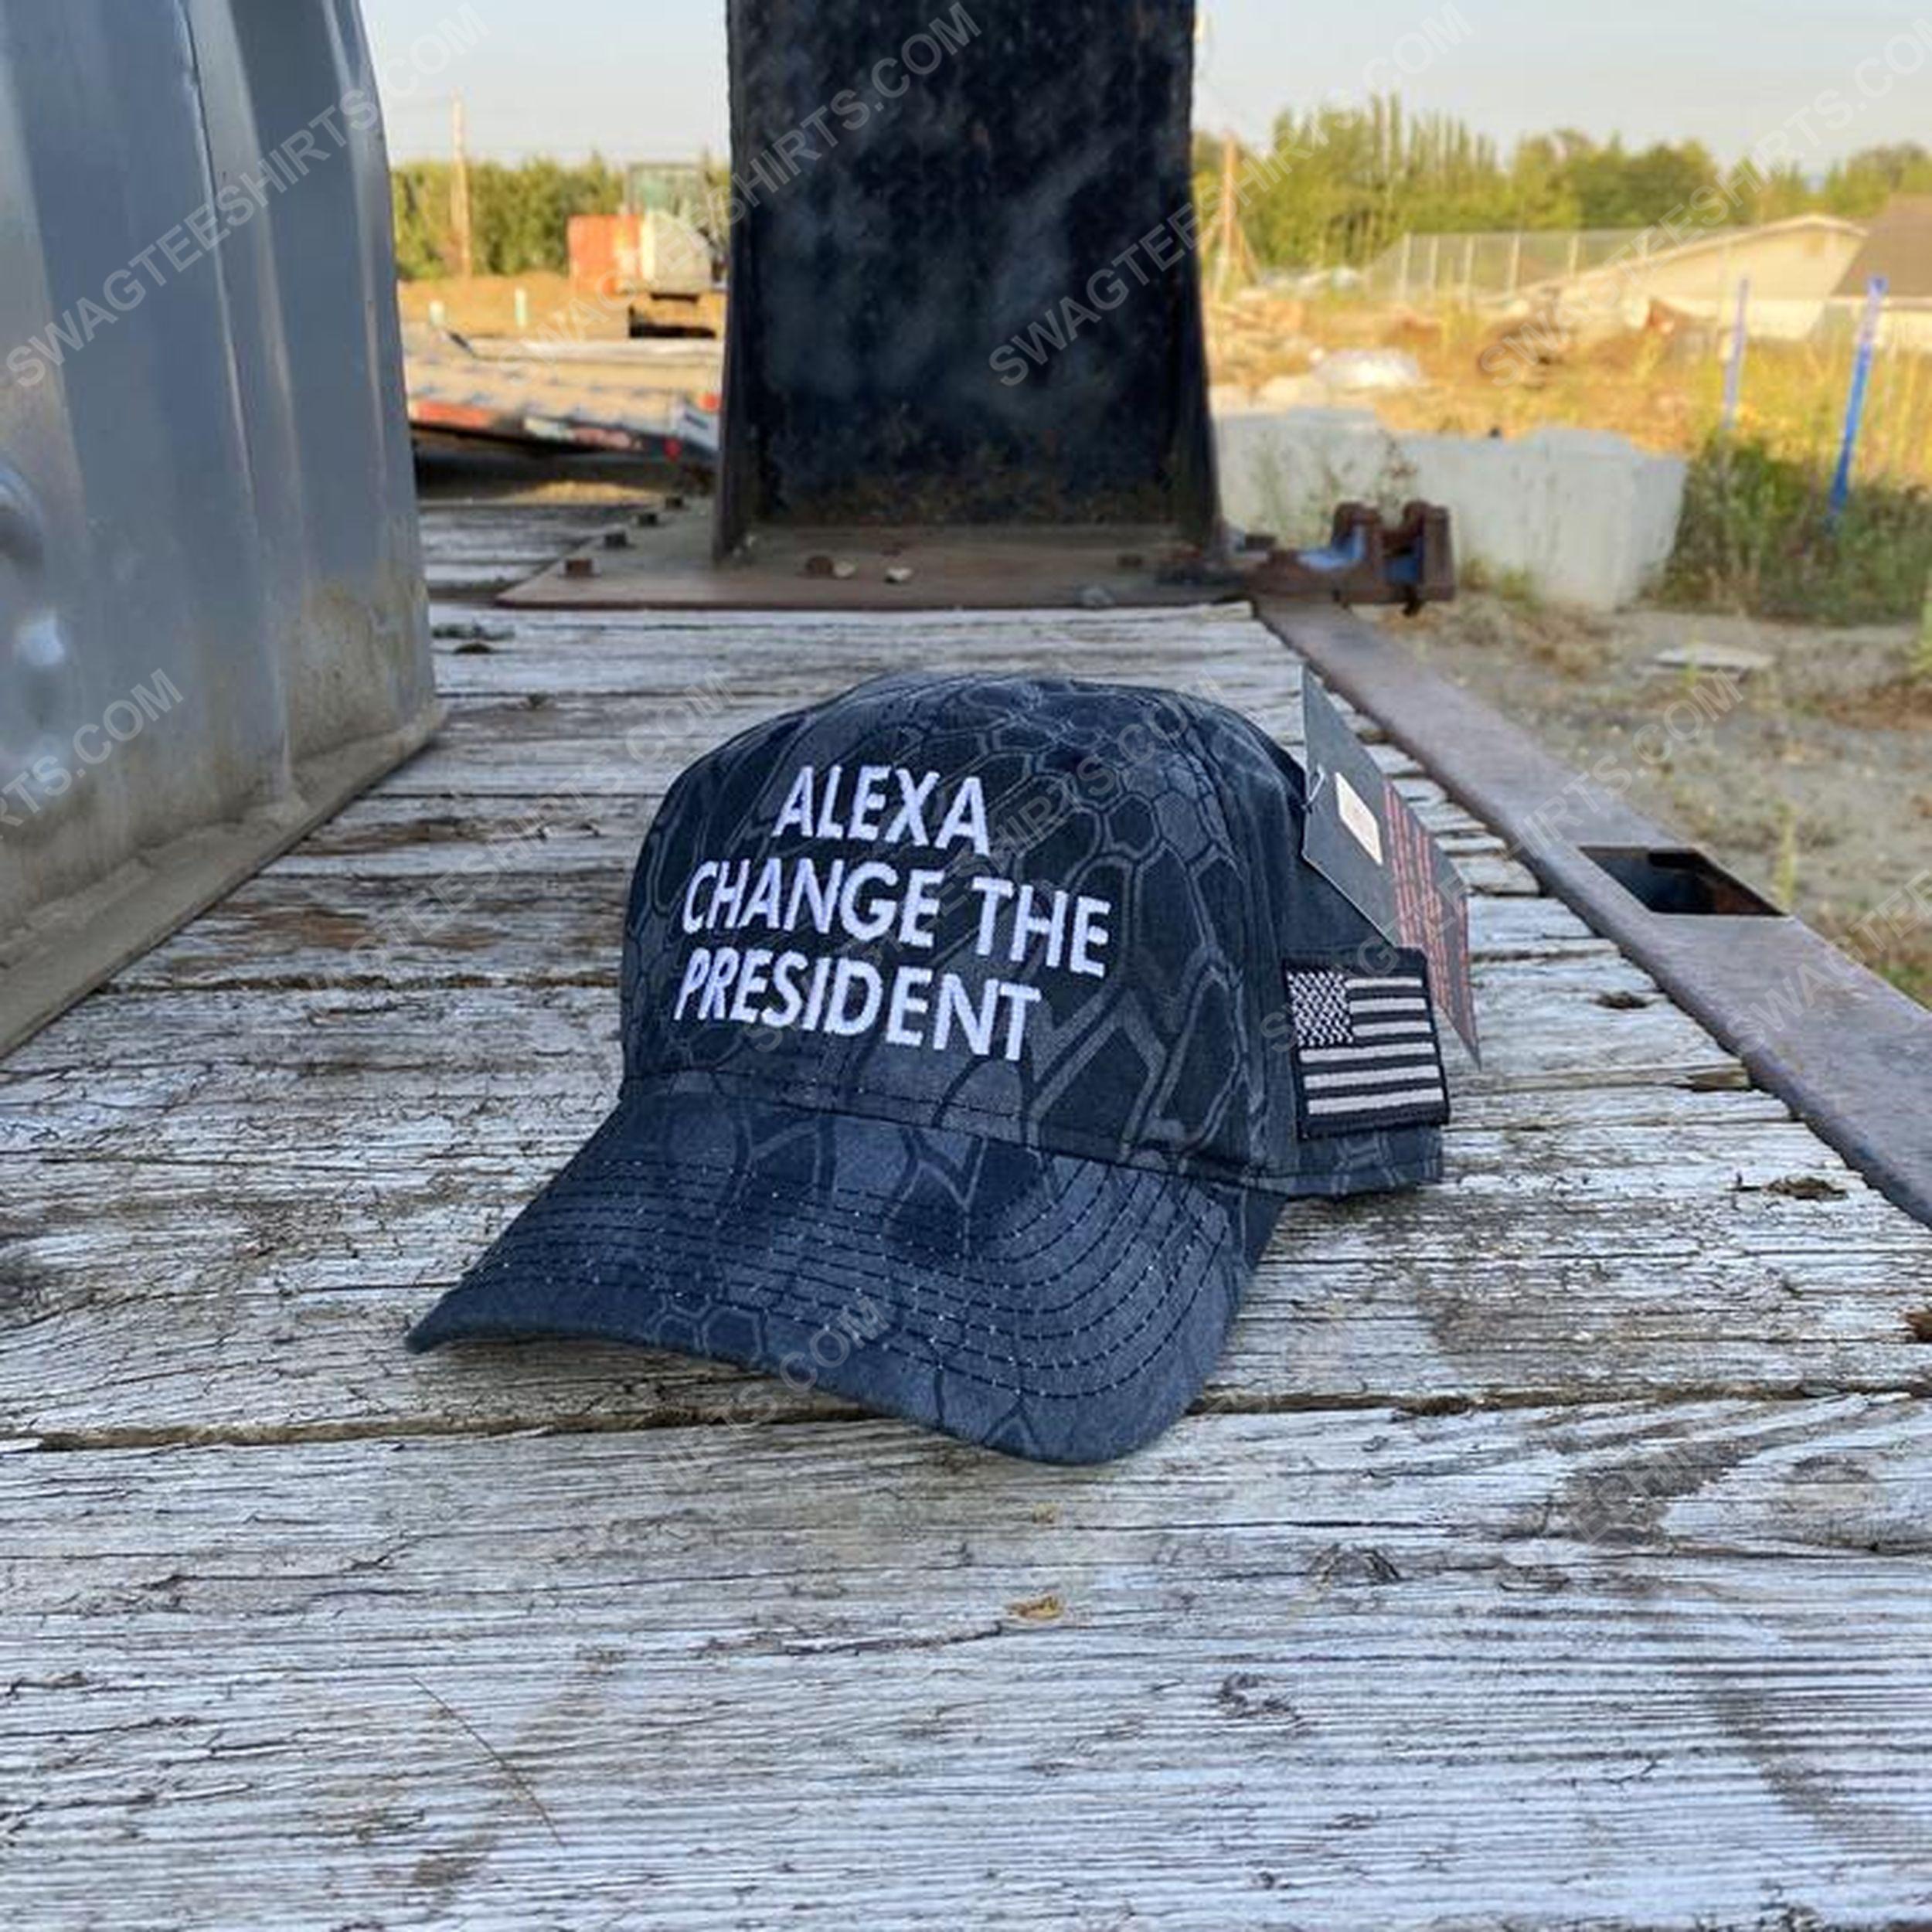 Alexa change the president full print classic hat 1 - Copy